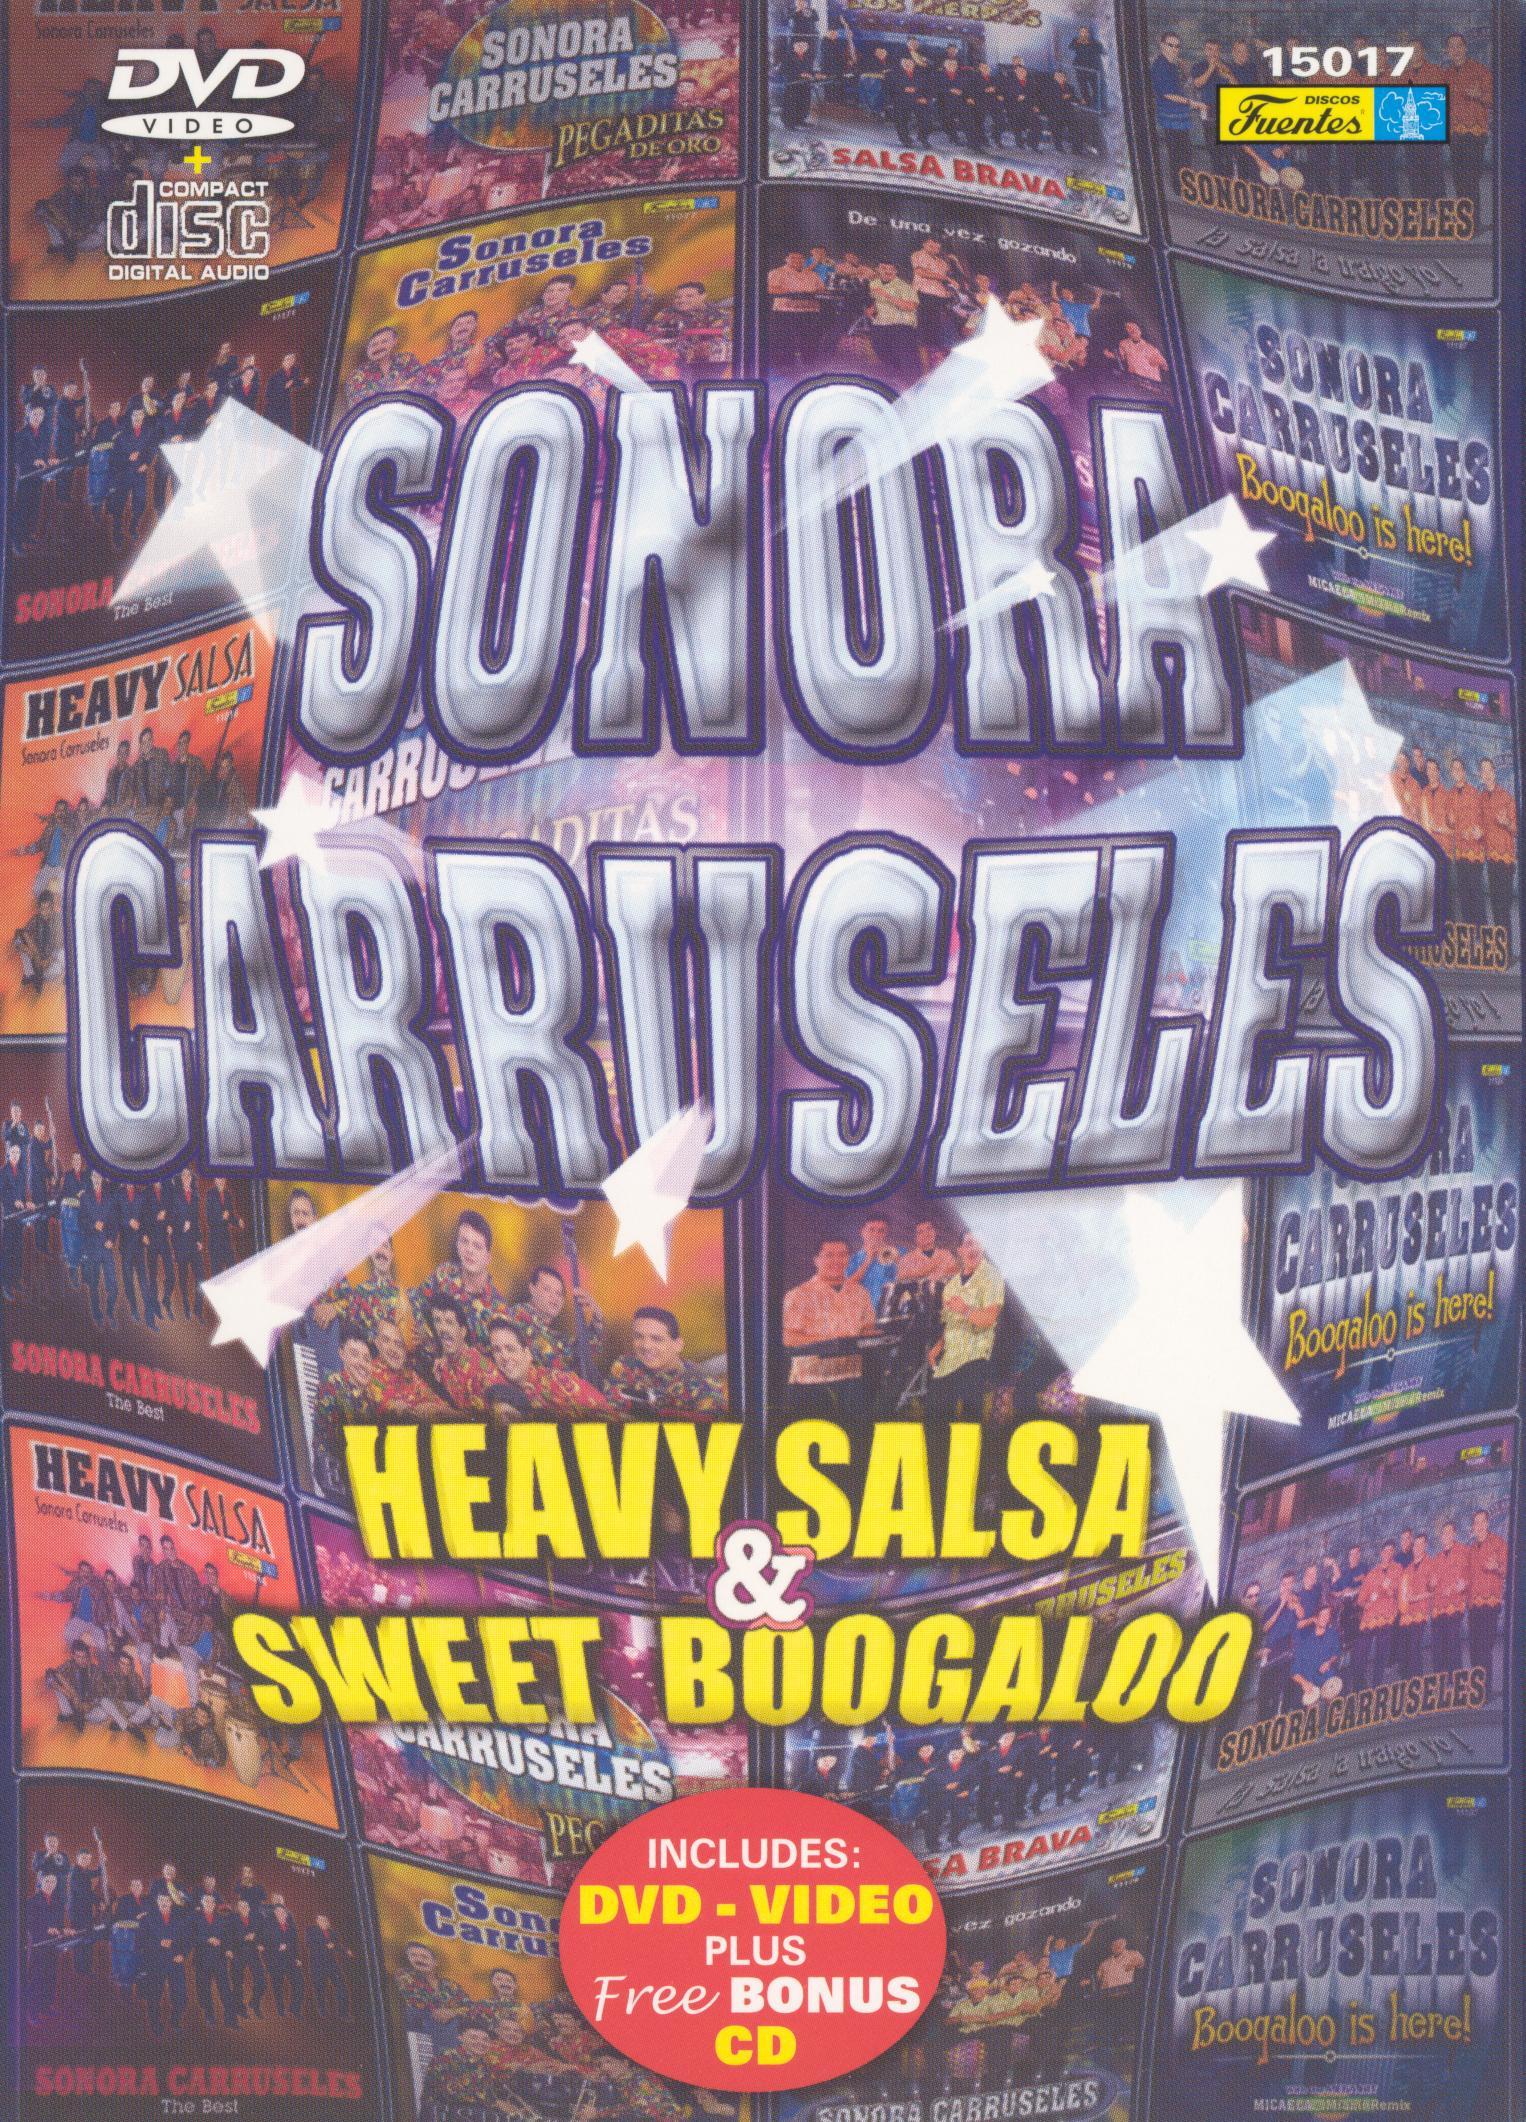 La Sonora Carruseles: Heavy Salsa & Sweet Boogaloo